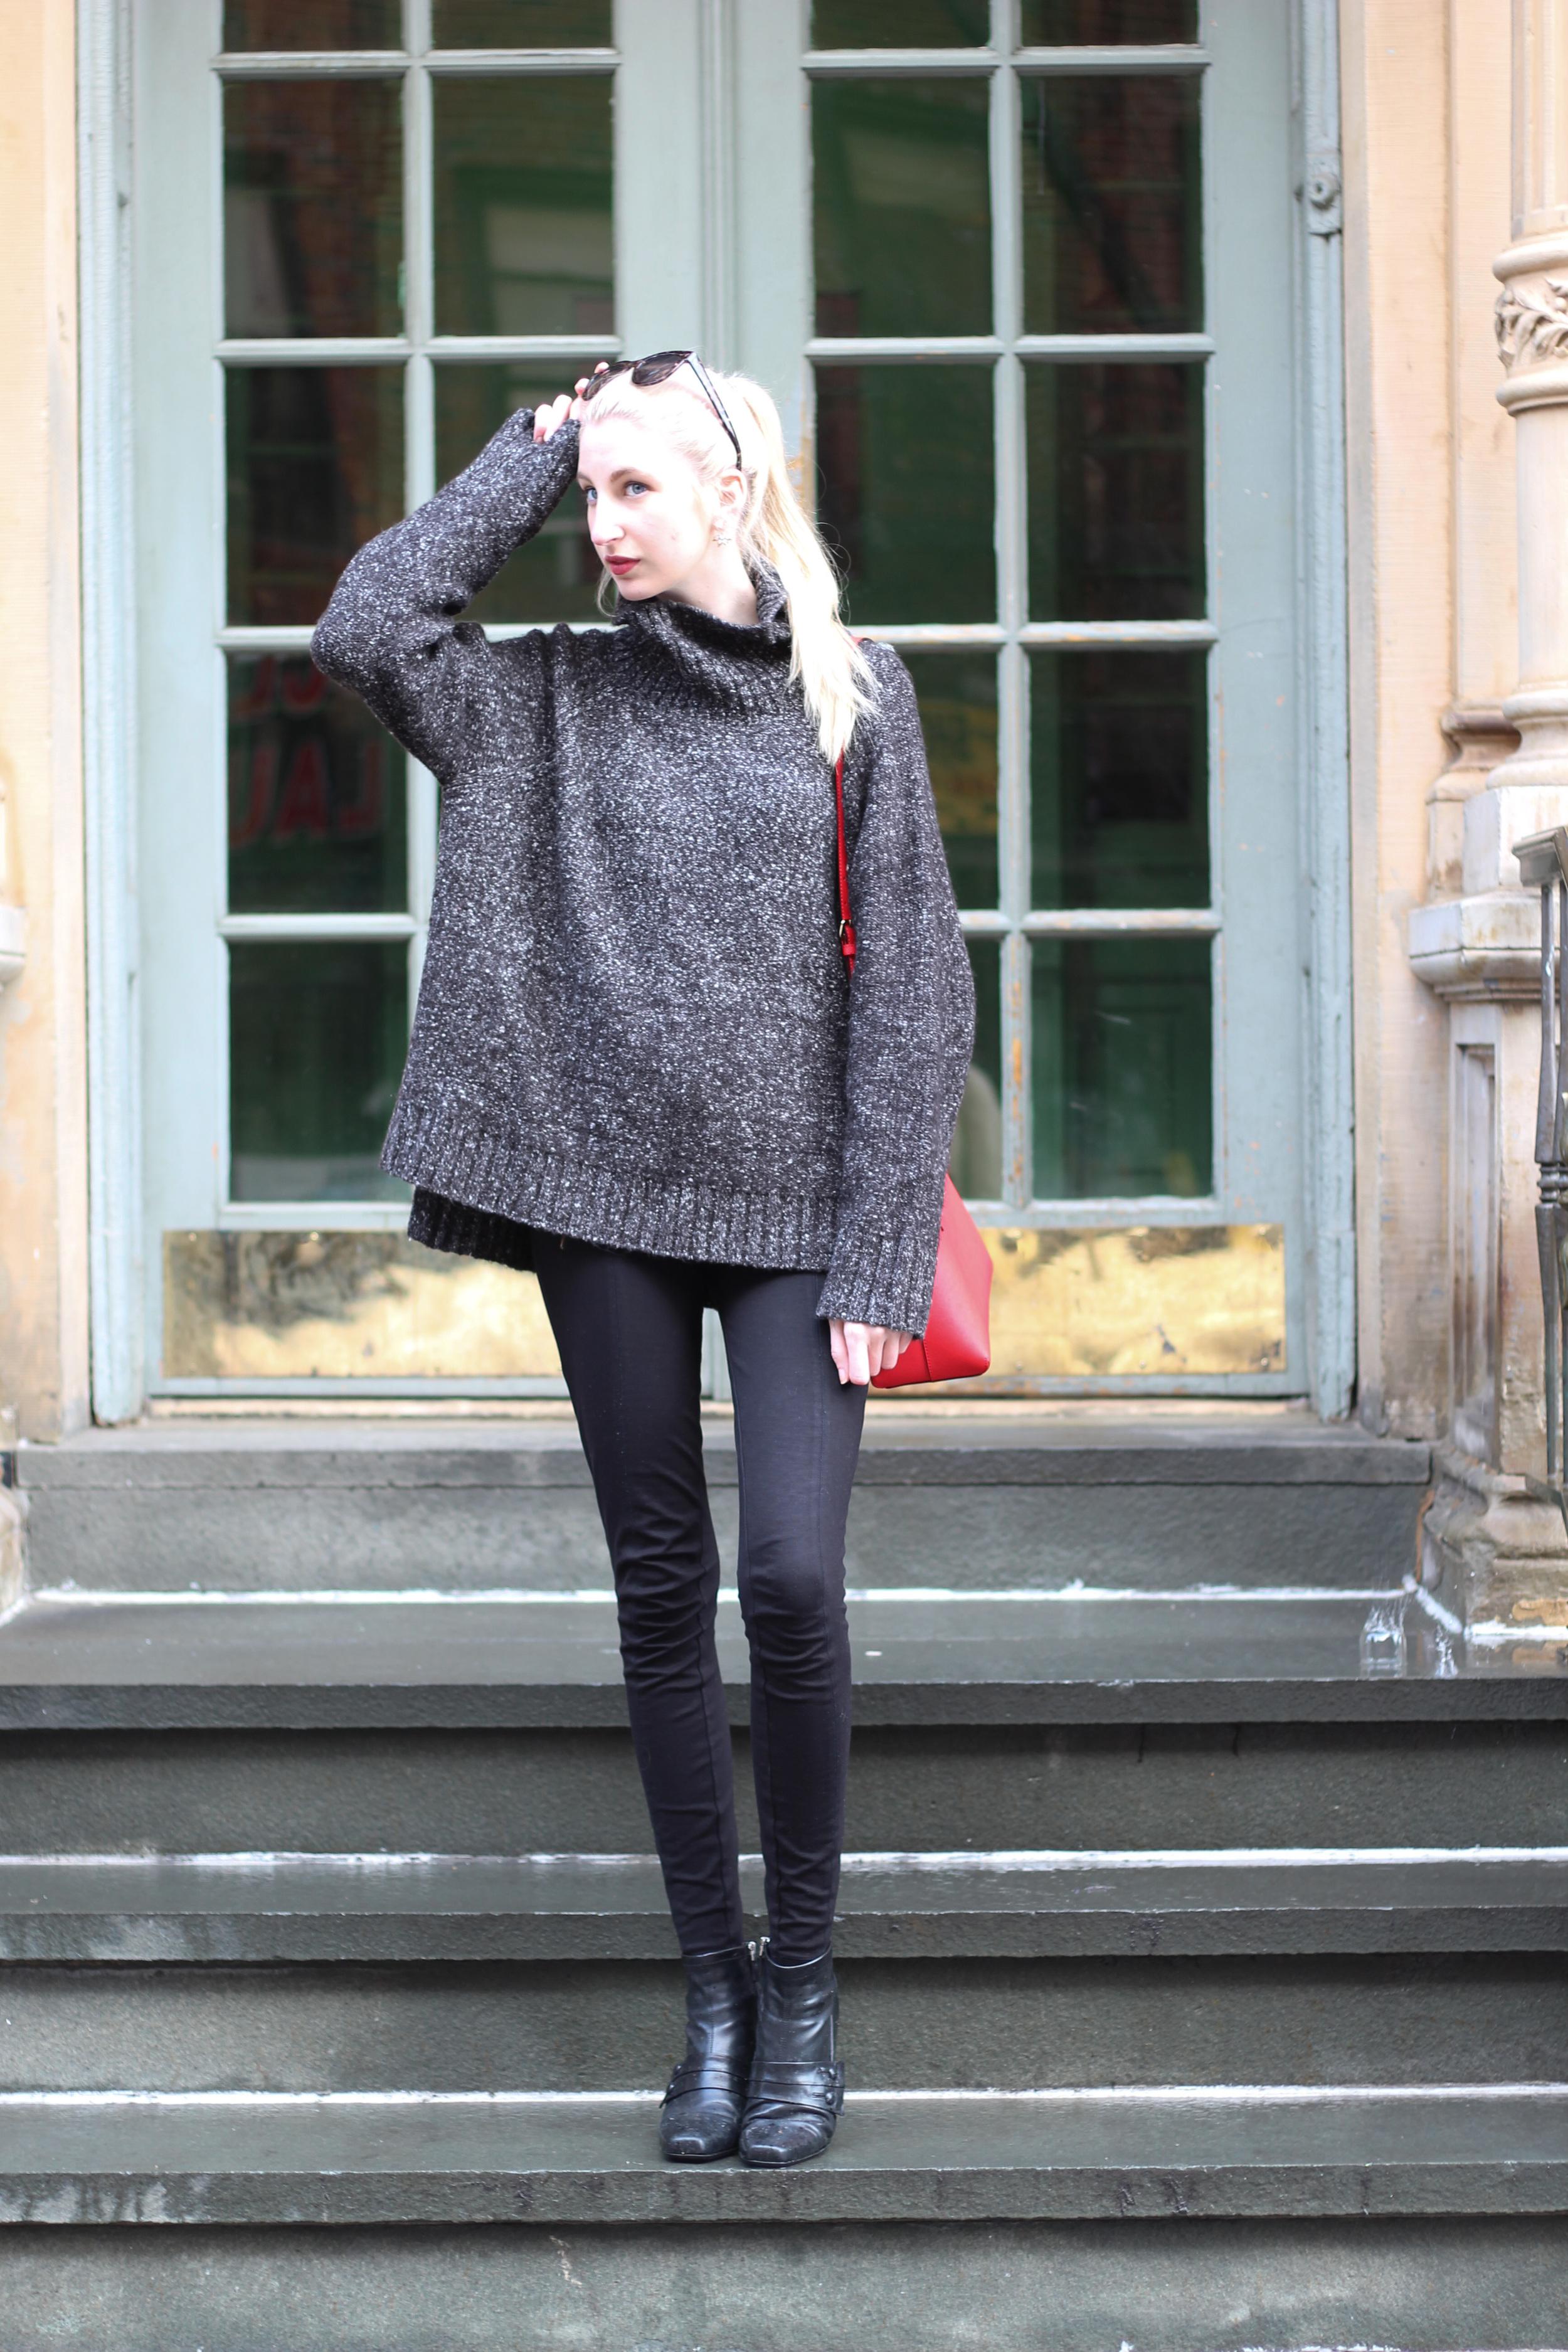 H&M oversized sweater, J.Crew Factory pixie pants, vintage boots, LOFT sunglasses, Elizabeth Arden lipstick, Kate Spade Cedar Street Maise in Cherry Liquer